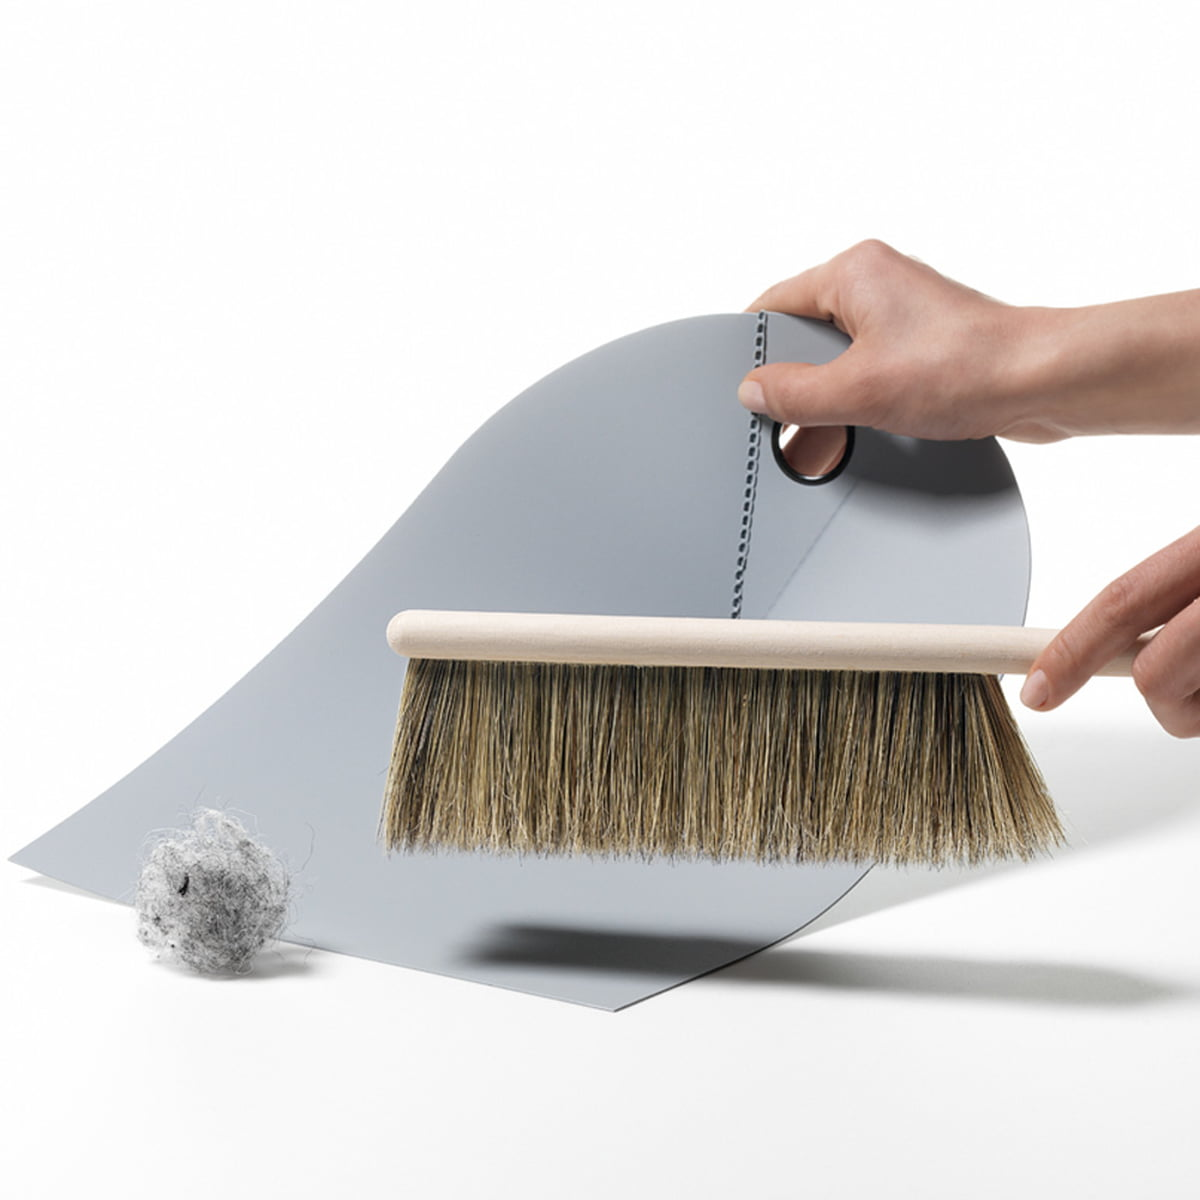 normann copenhagen dustpan and brush. Black Bedroom Furniture Sets. Home Design Ideas